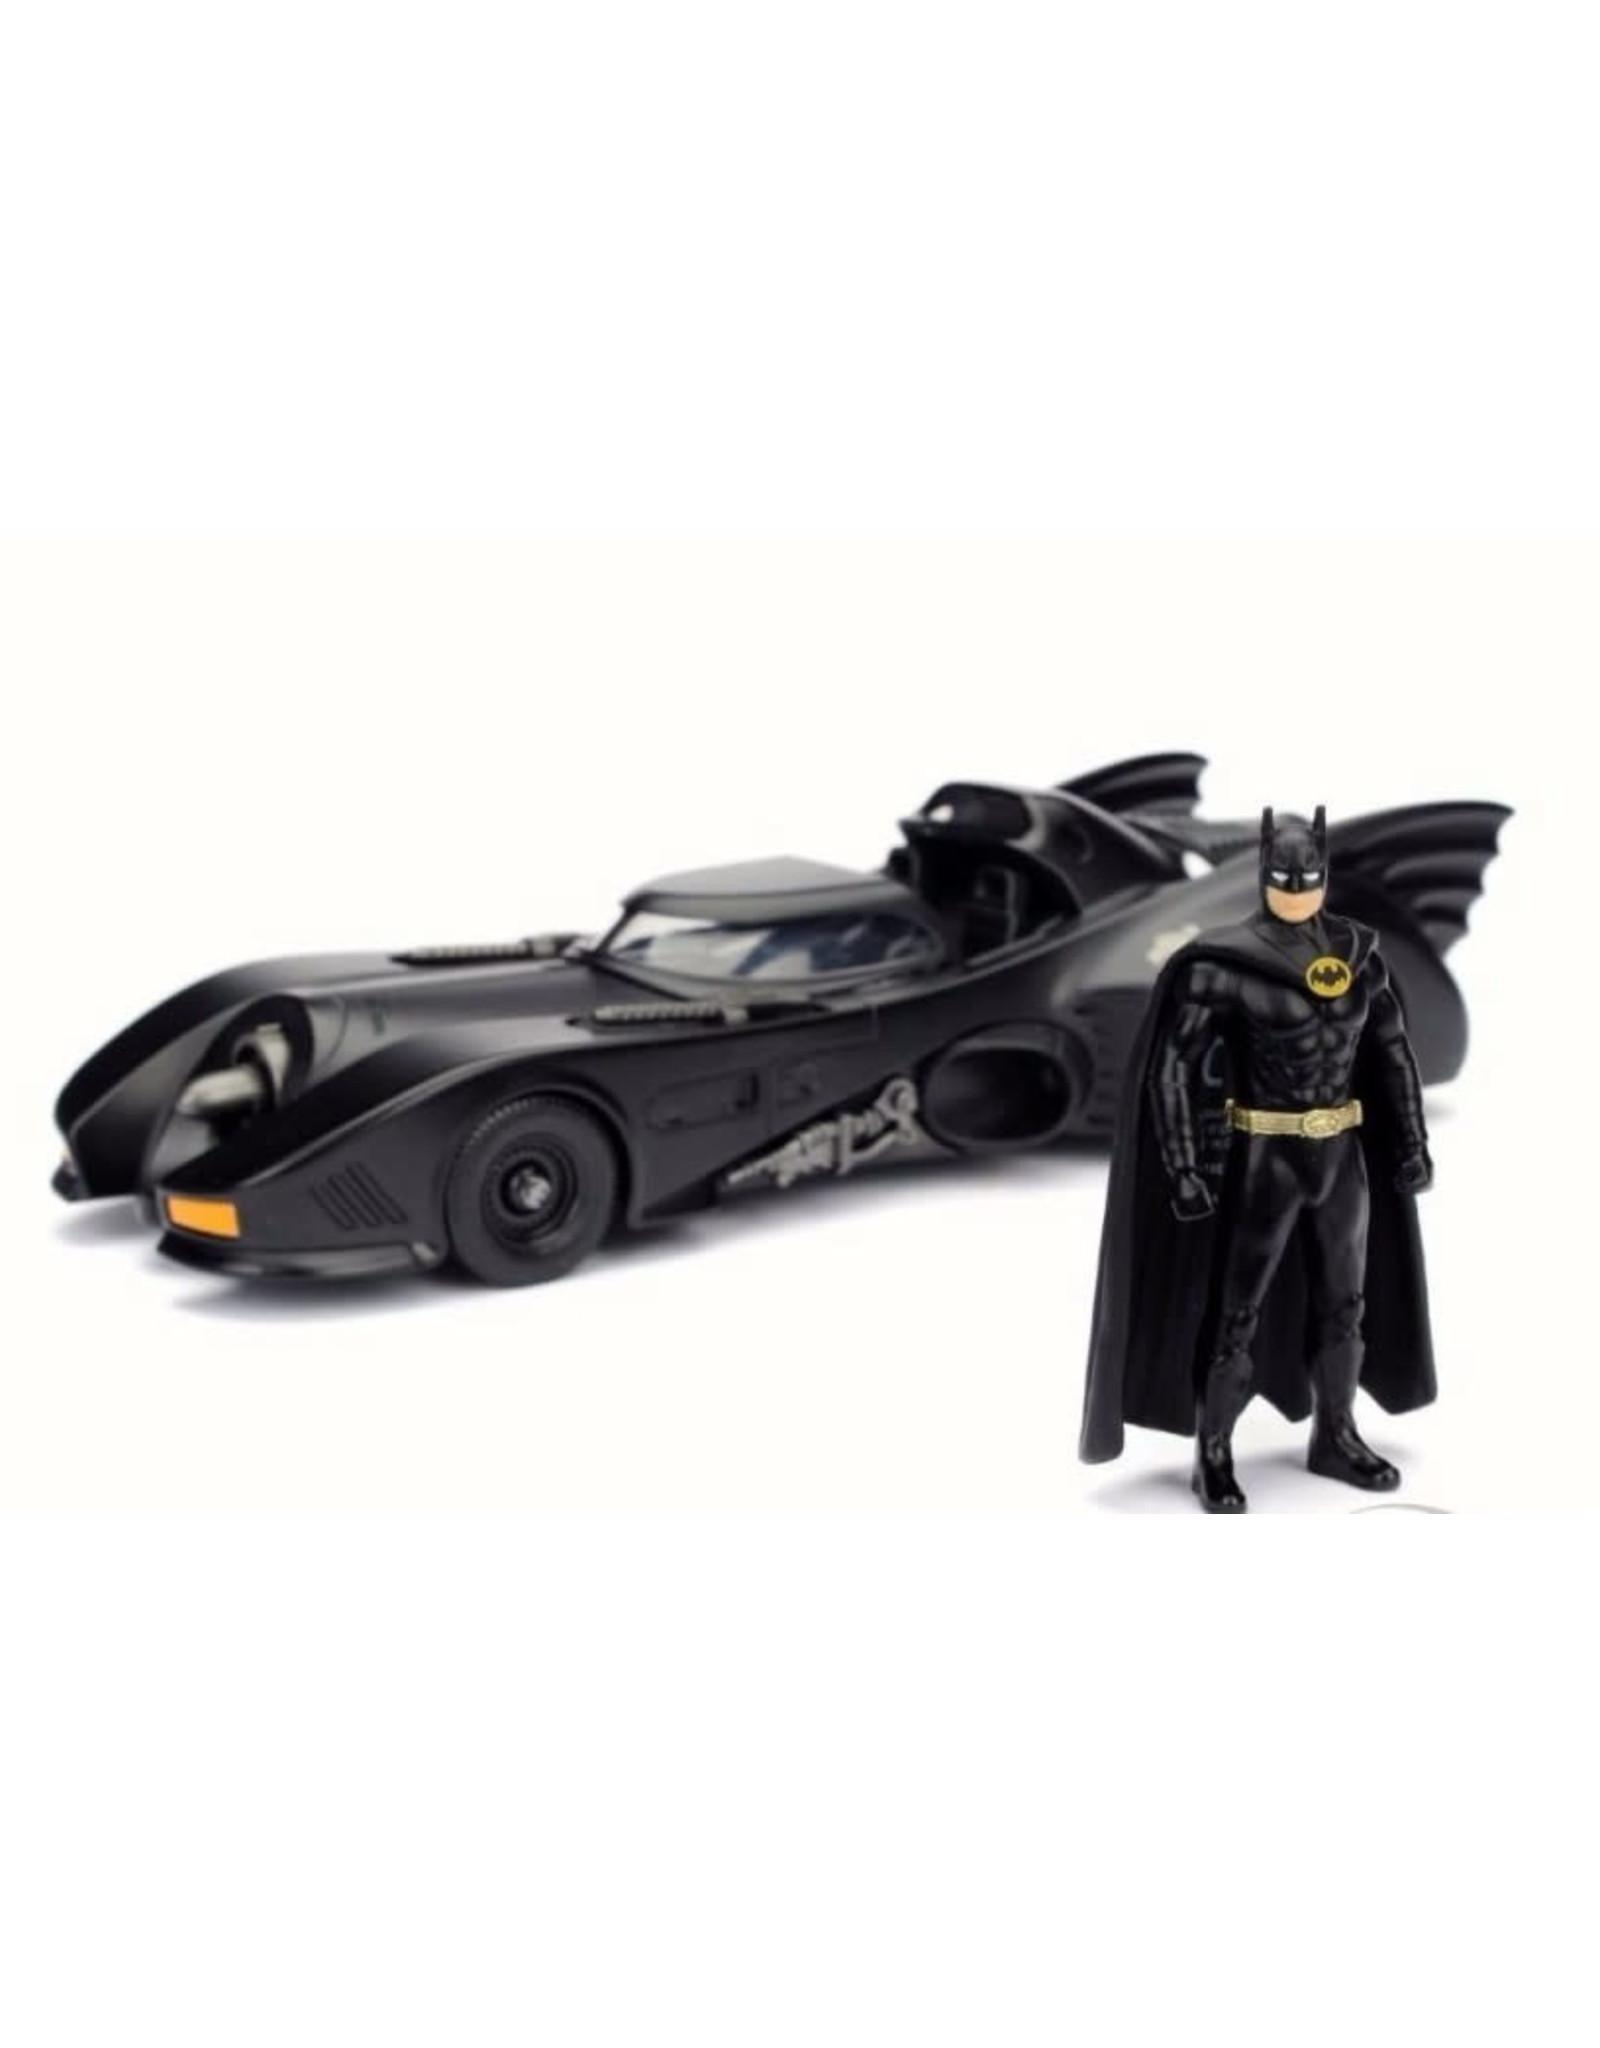 Jada Toys BATMAN Scale Model 1:24 - 1989 Batmobile